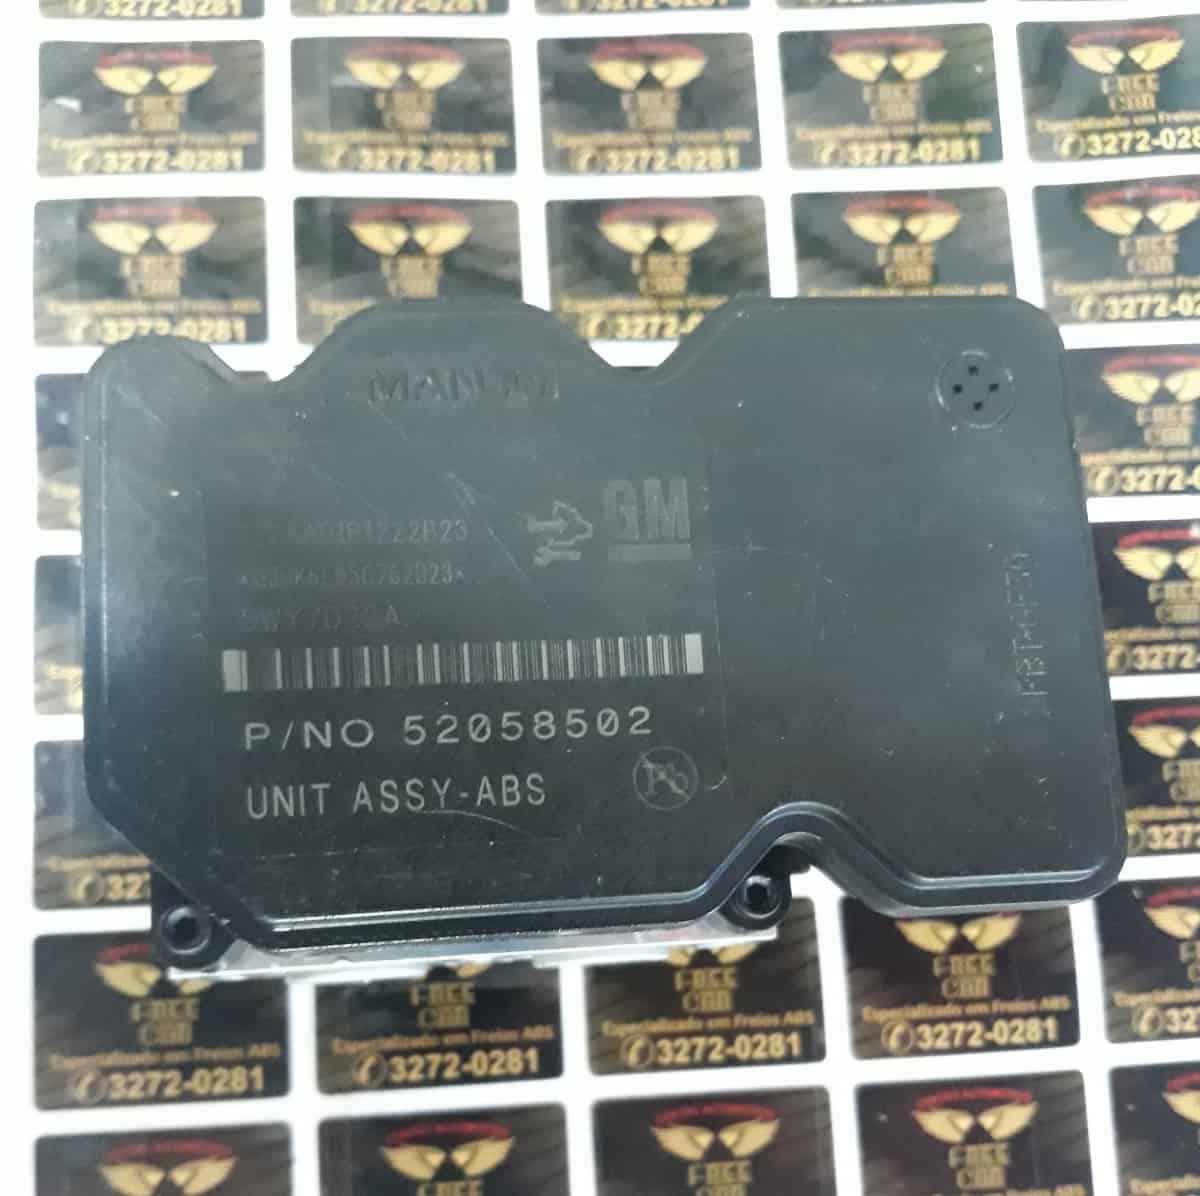 Modulo ABS Chevrolet 52058502 - Foto 1